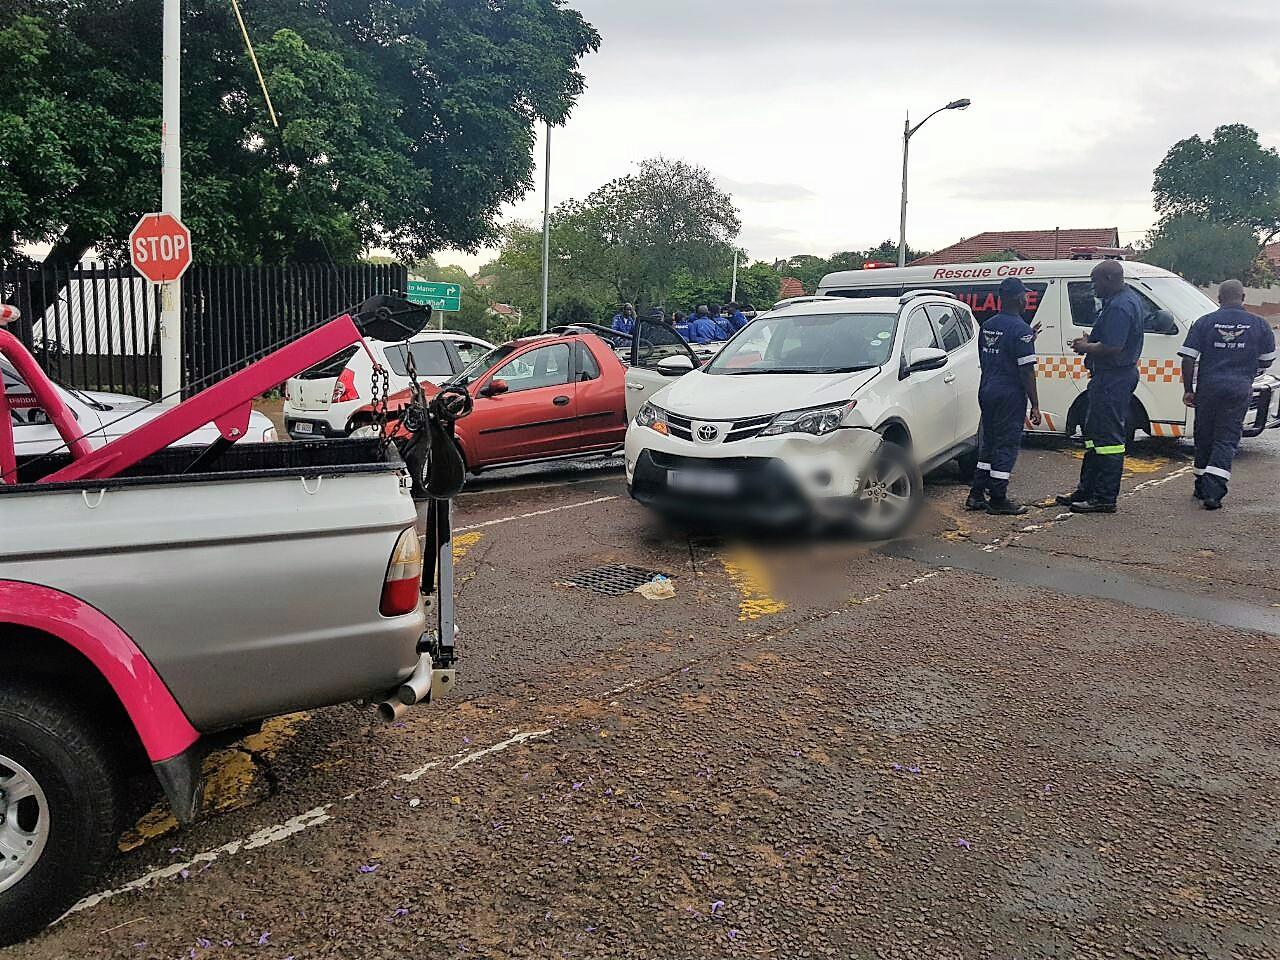 1 Injured in Glenwood crash